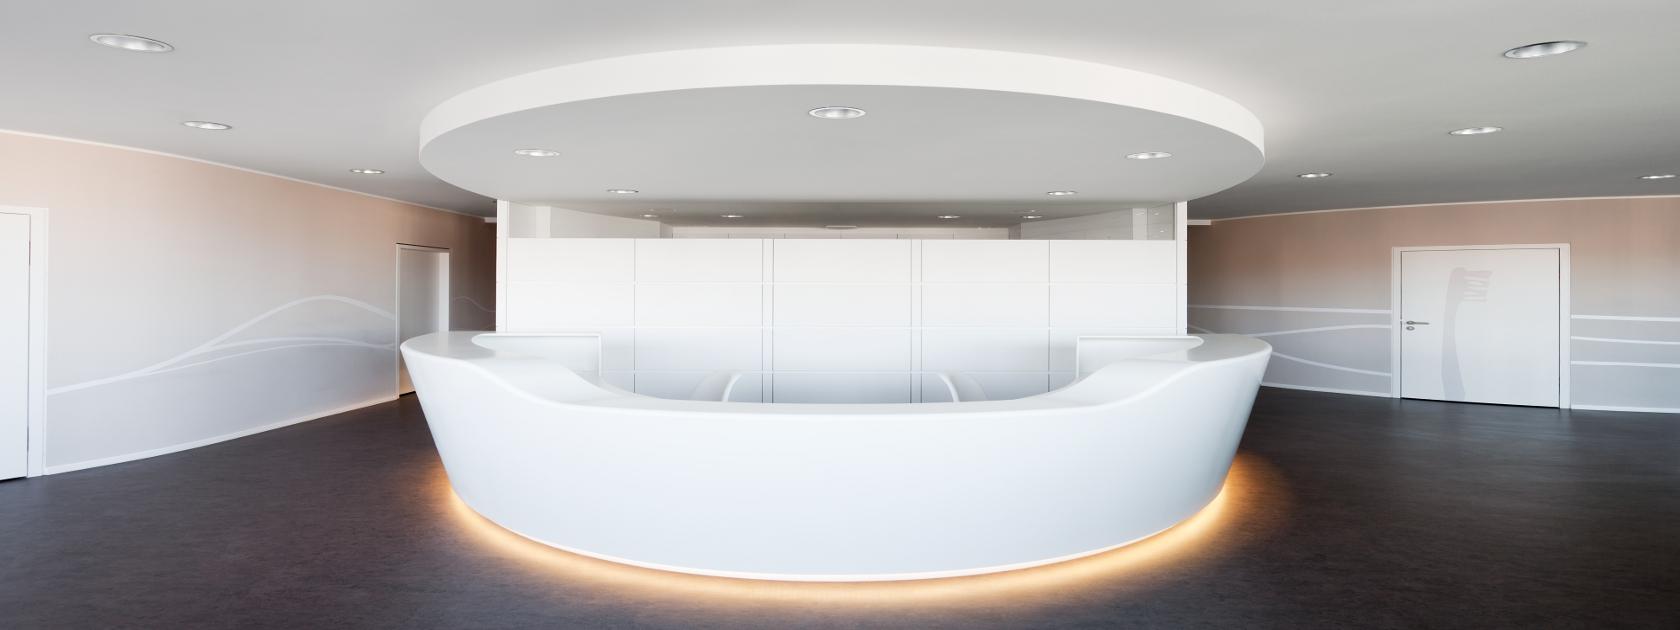 zahnarztpraxis in pirmasens pfeiffer gmbh co kg. Black Bedroom Furniture Sets. Home Design Ideas